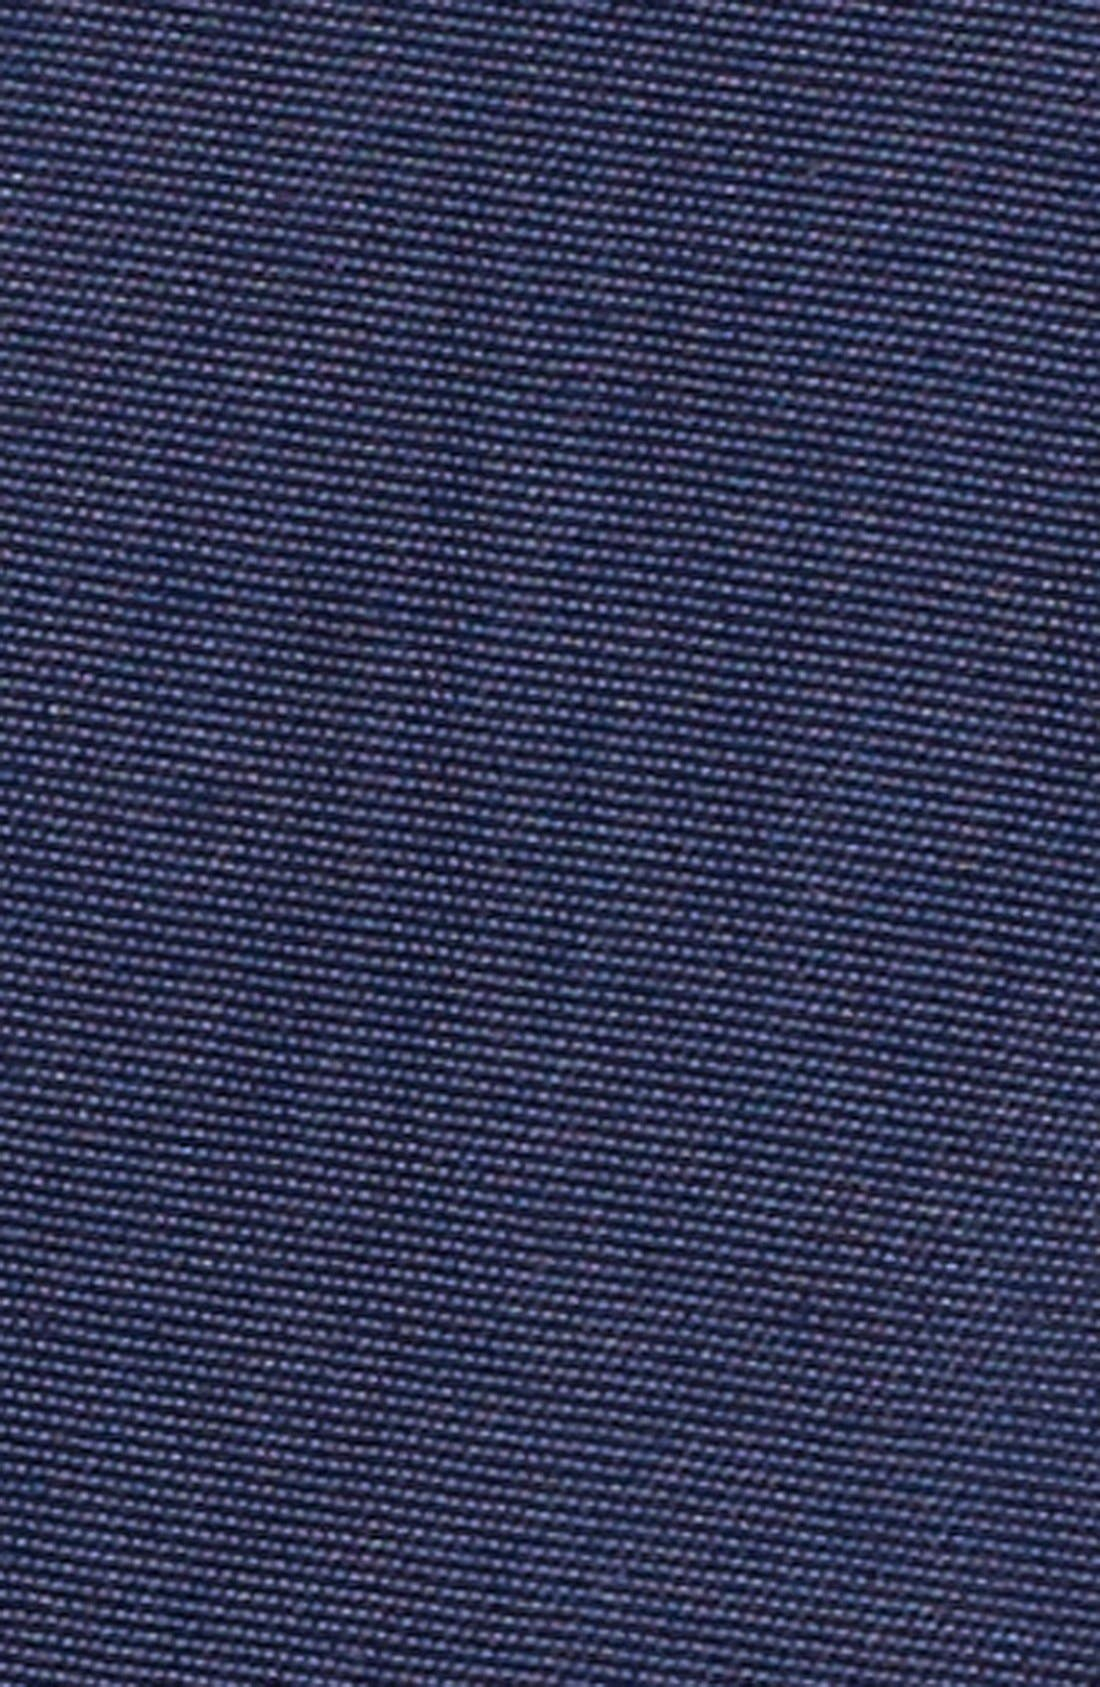 Aruba Tailored Fit 8.5 Inch Swim Trunks,                             Alternate thumbnail 10, color,                             415